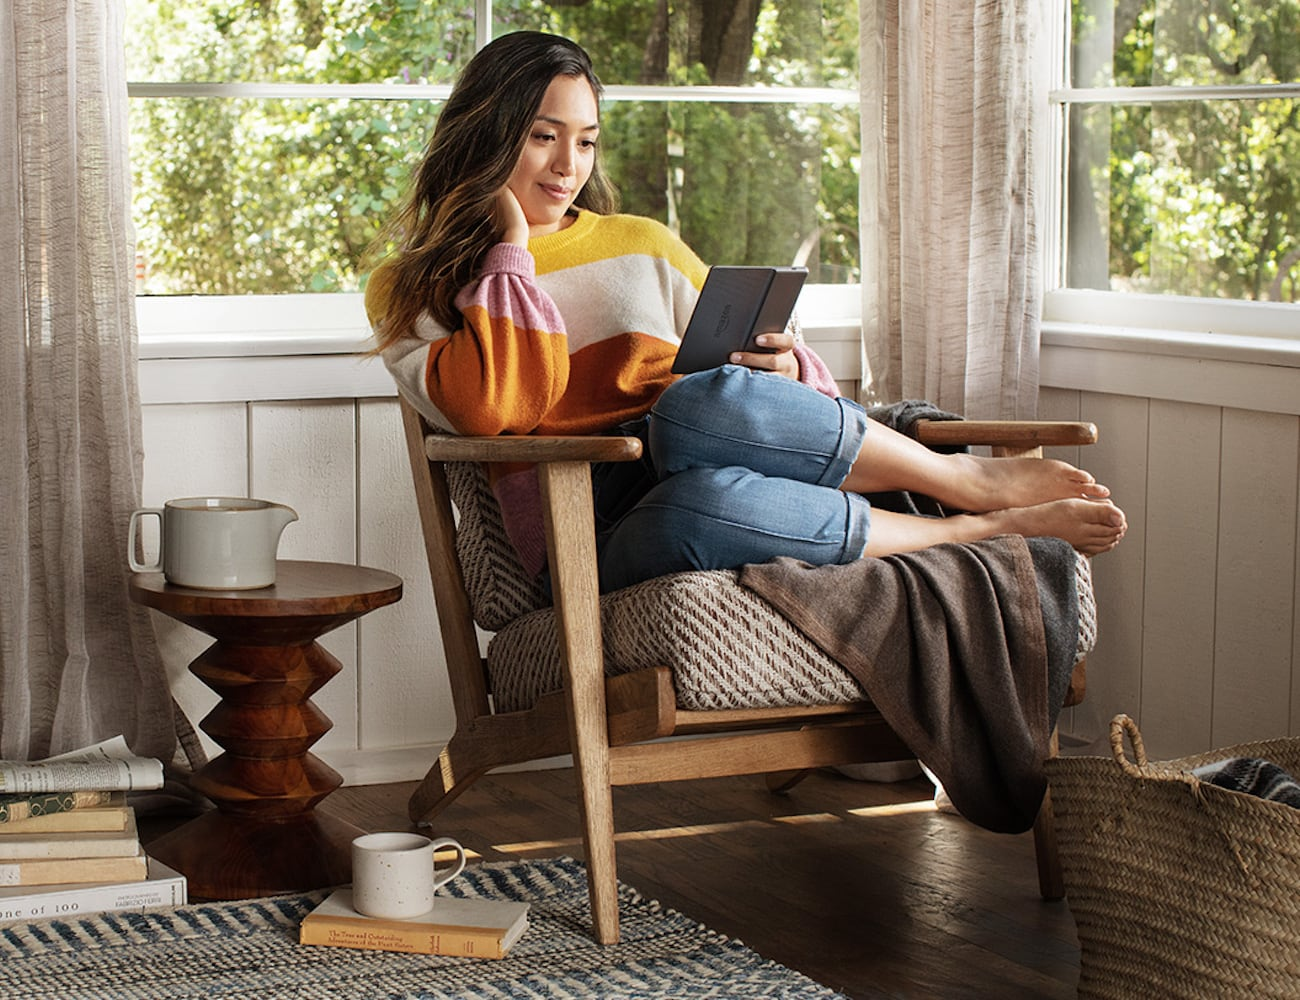 Kindle Oasis Warm Light E-reader